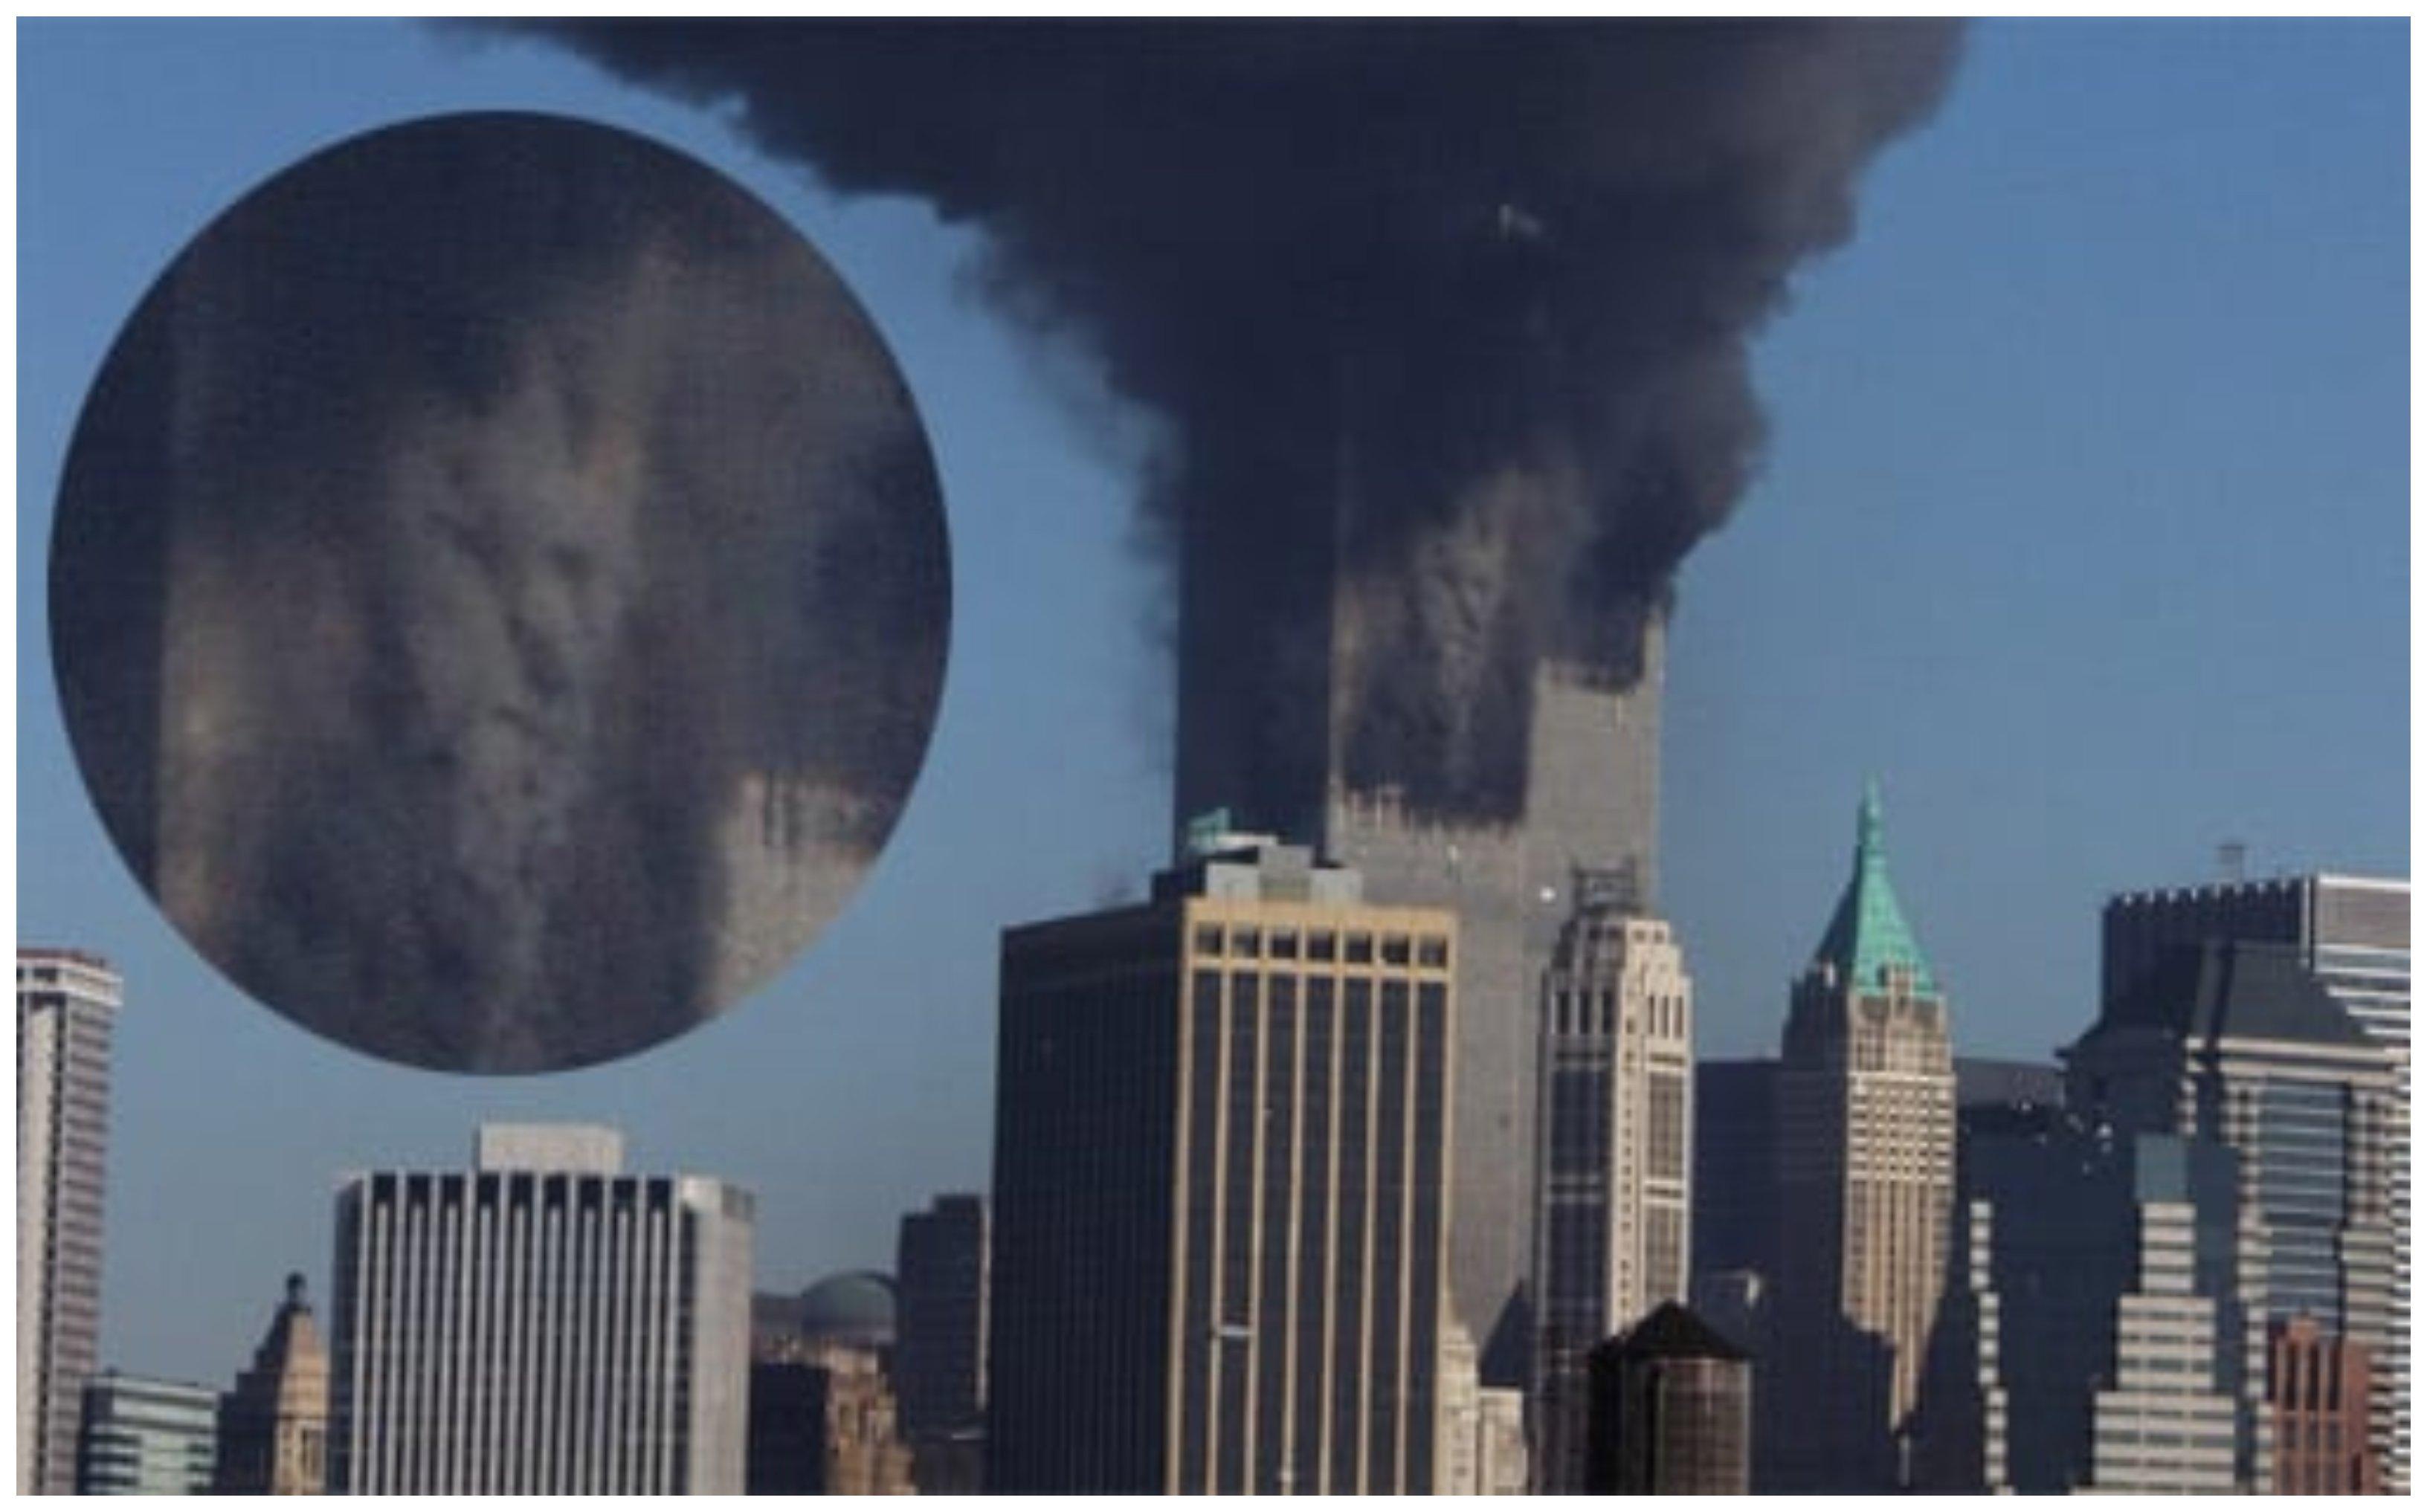 La víctima 3001 del 11-S. Peligro de guerra global: Israe...